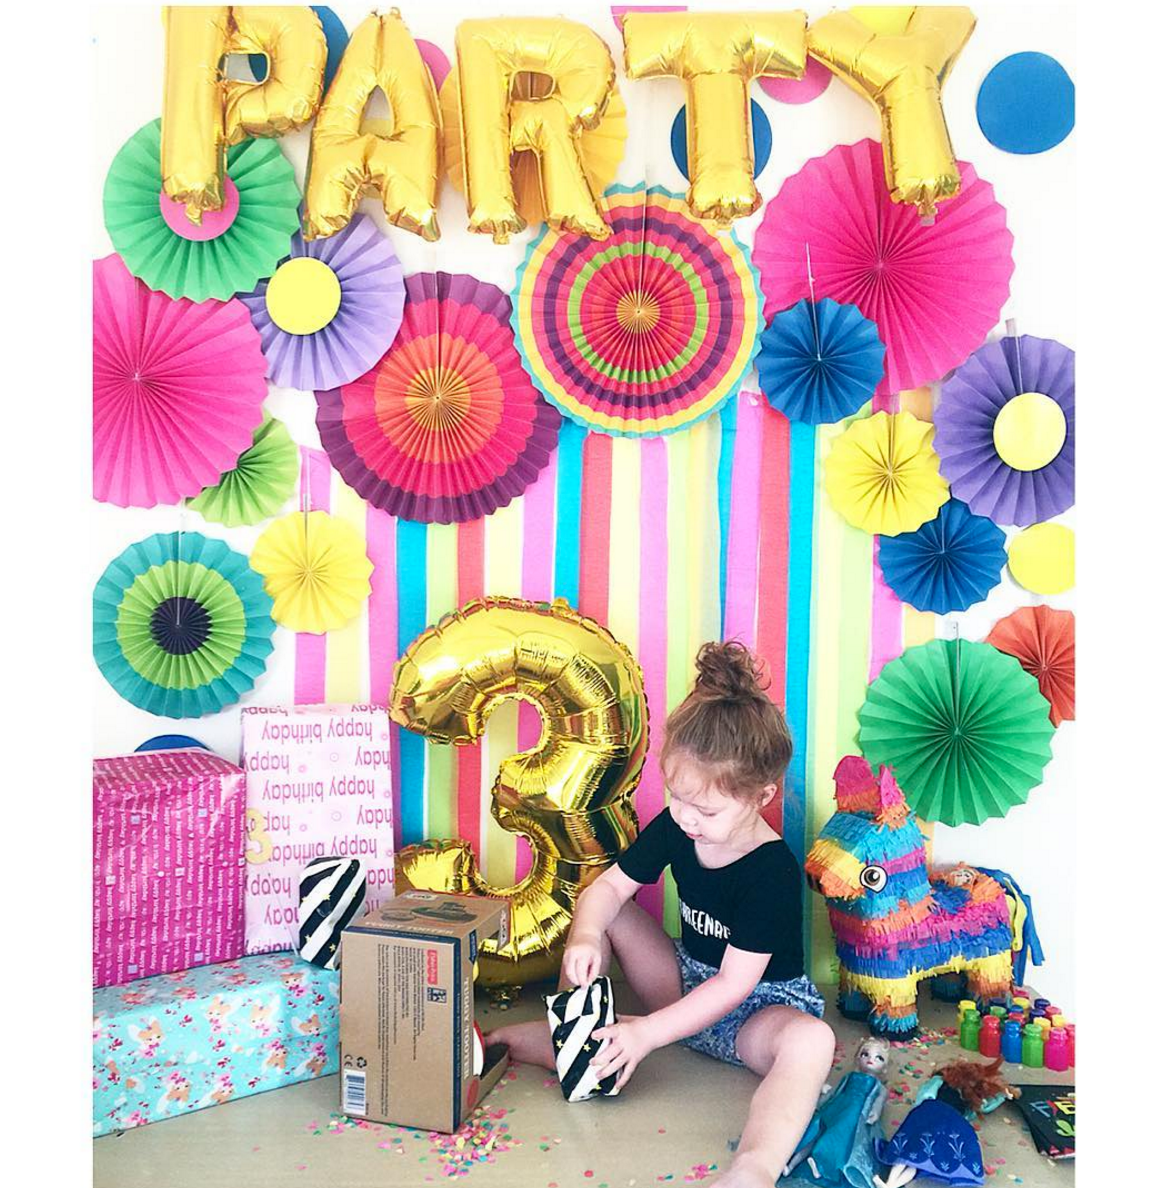 #THREENAGER leotard to celebrate Evie's third birthday! @sheloveslaughslives